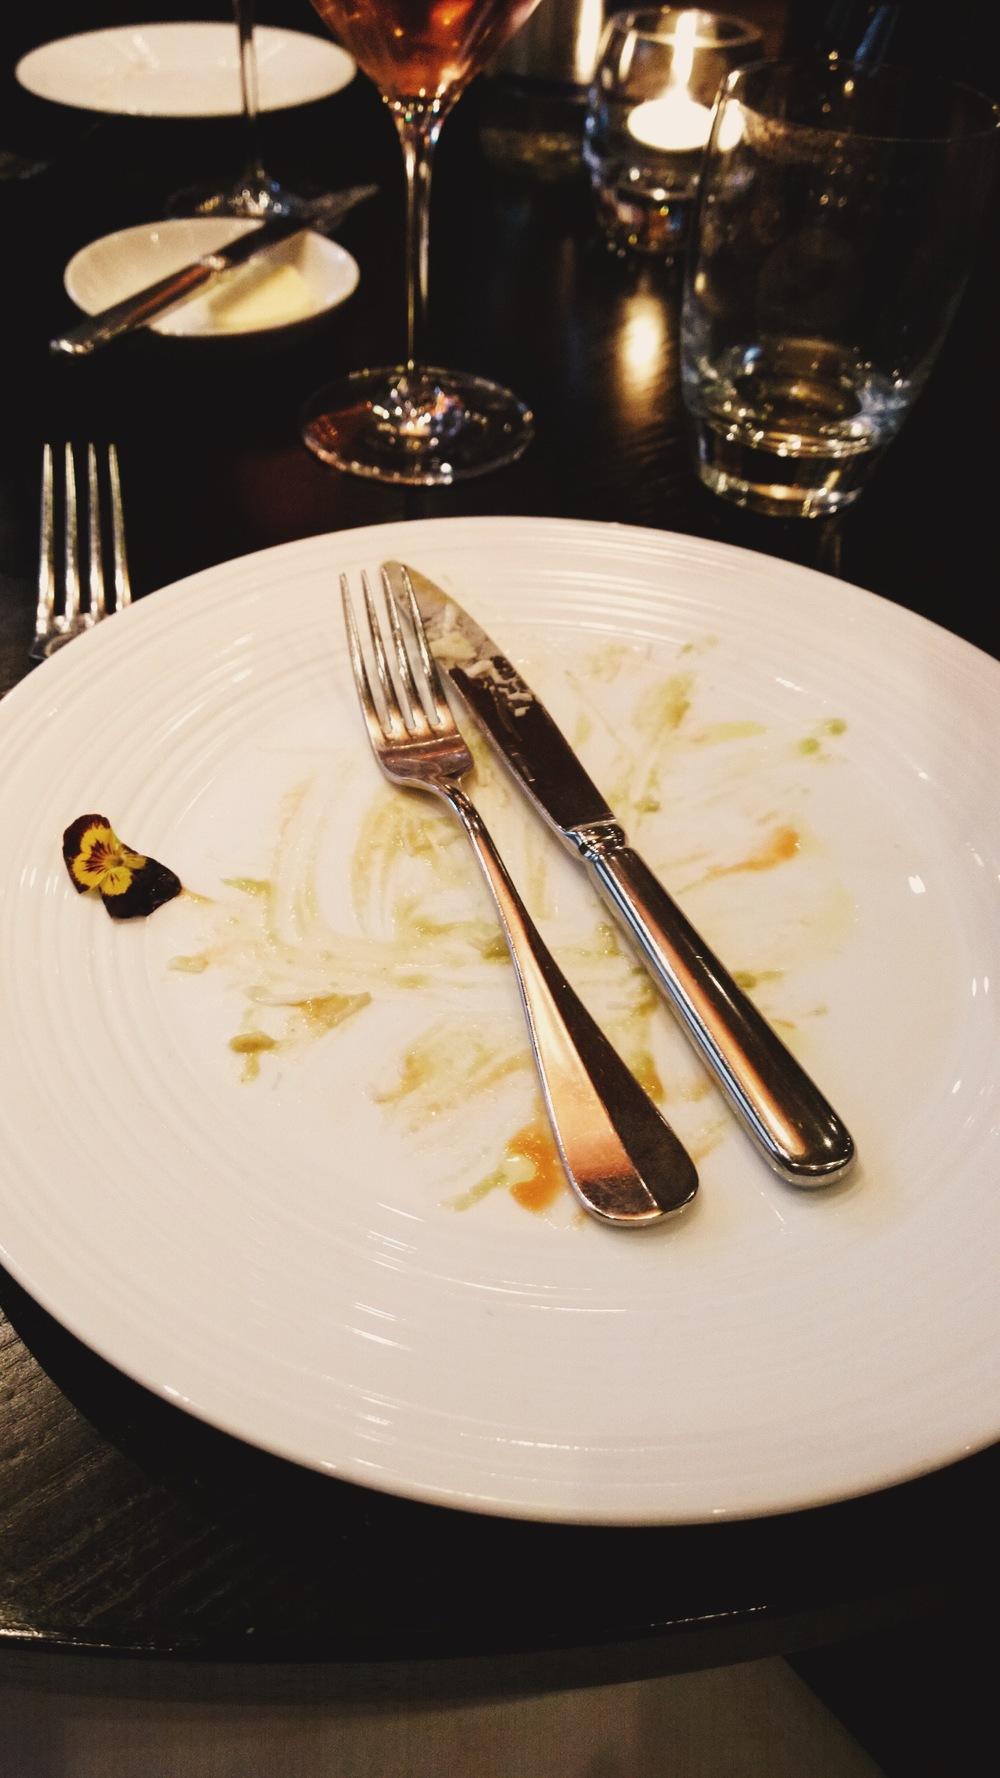 sarah akwisombe restaurant review